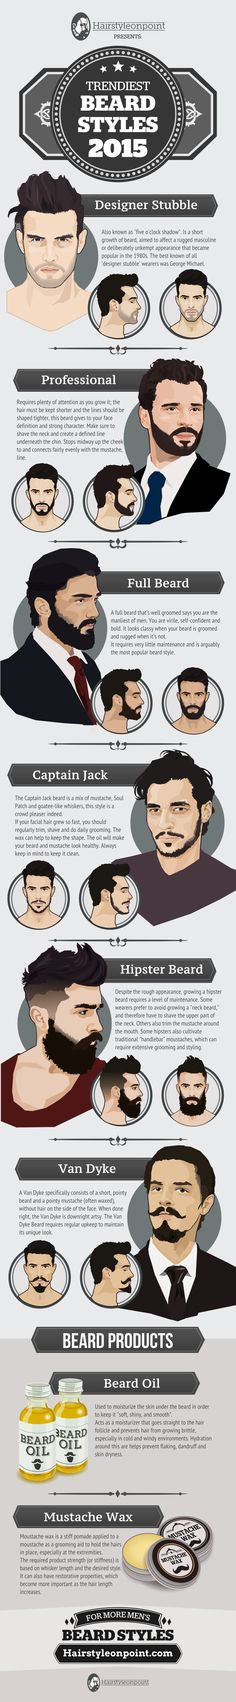 Trendiest Beard Styles 2015 - Imgur